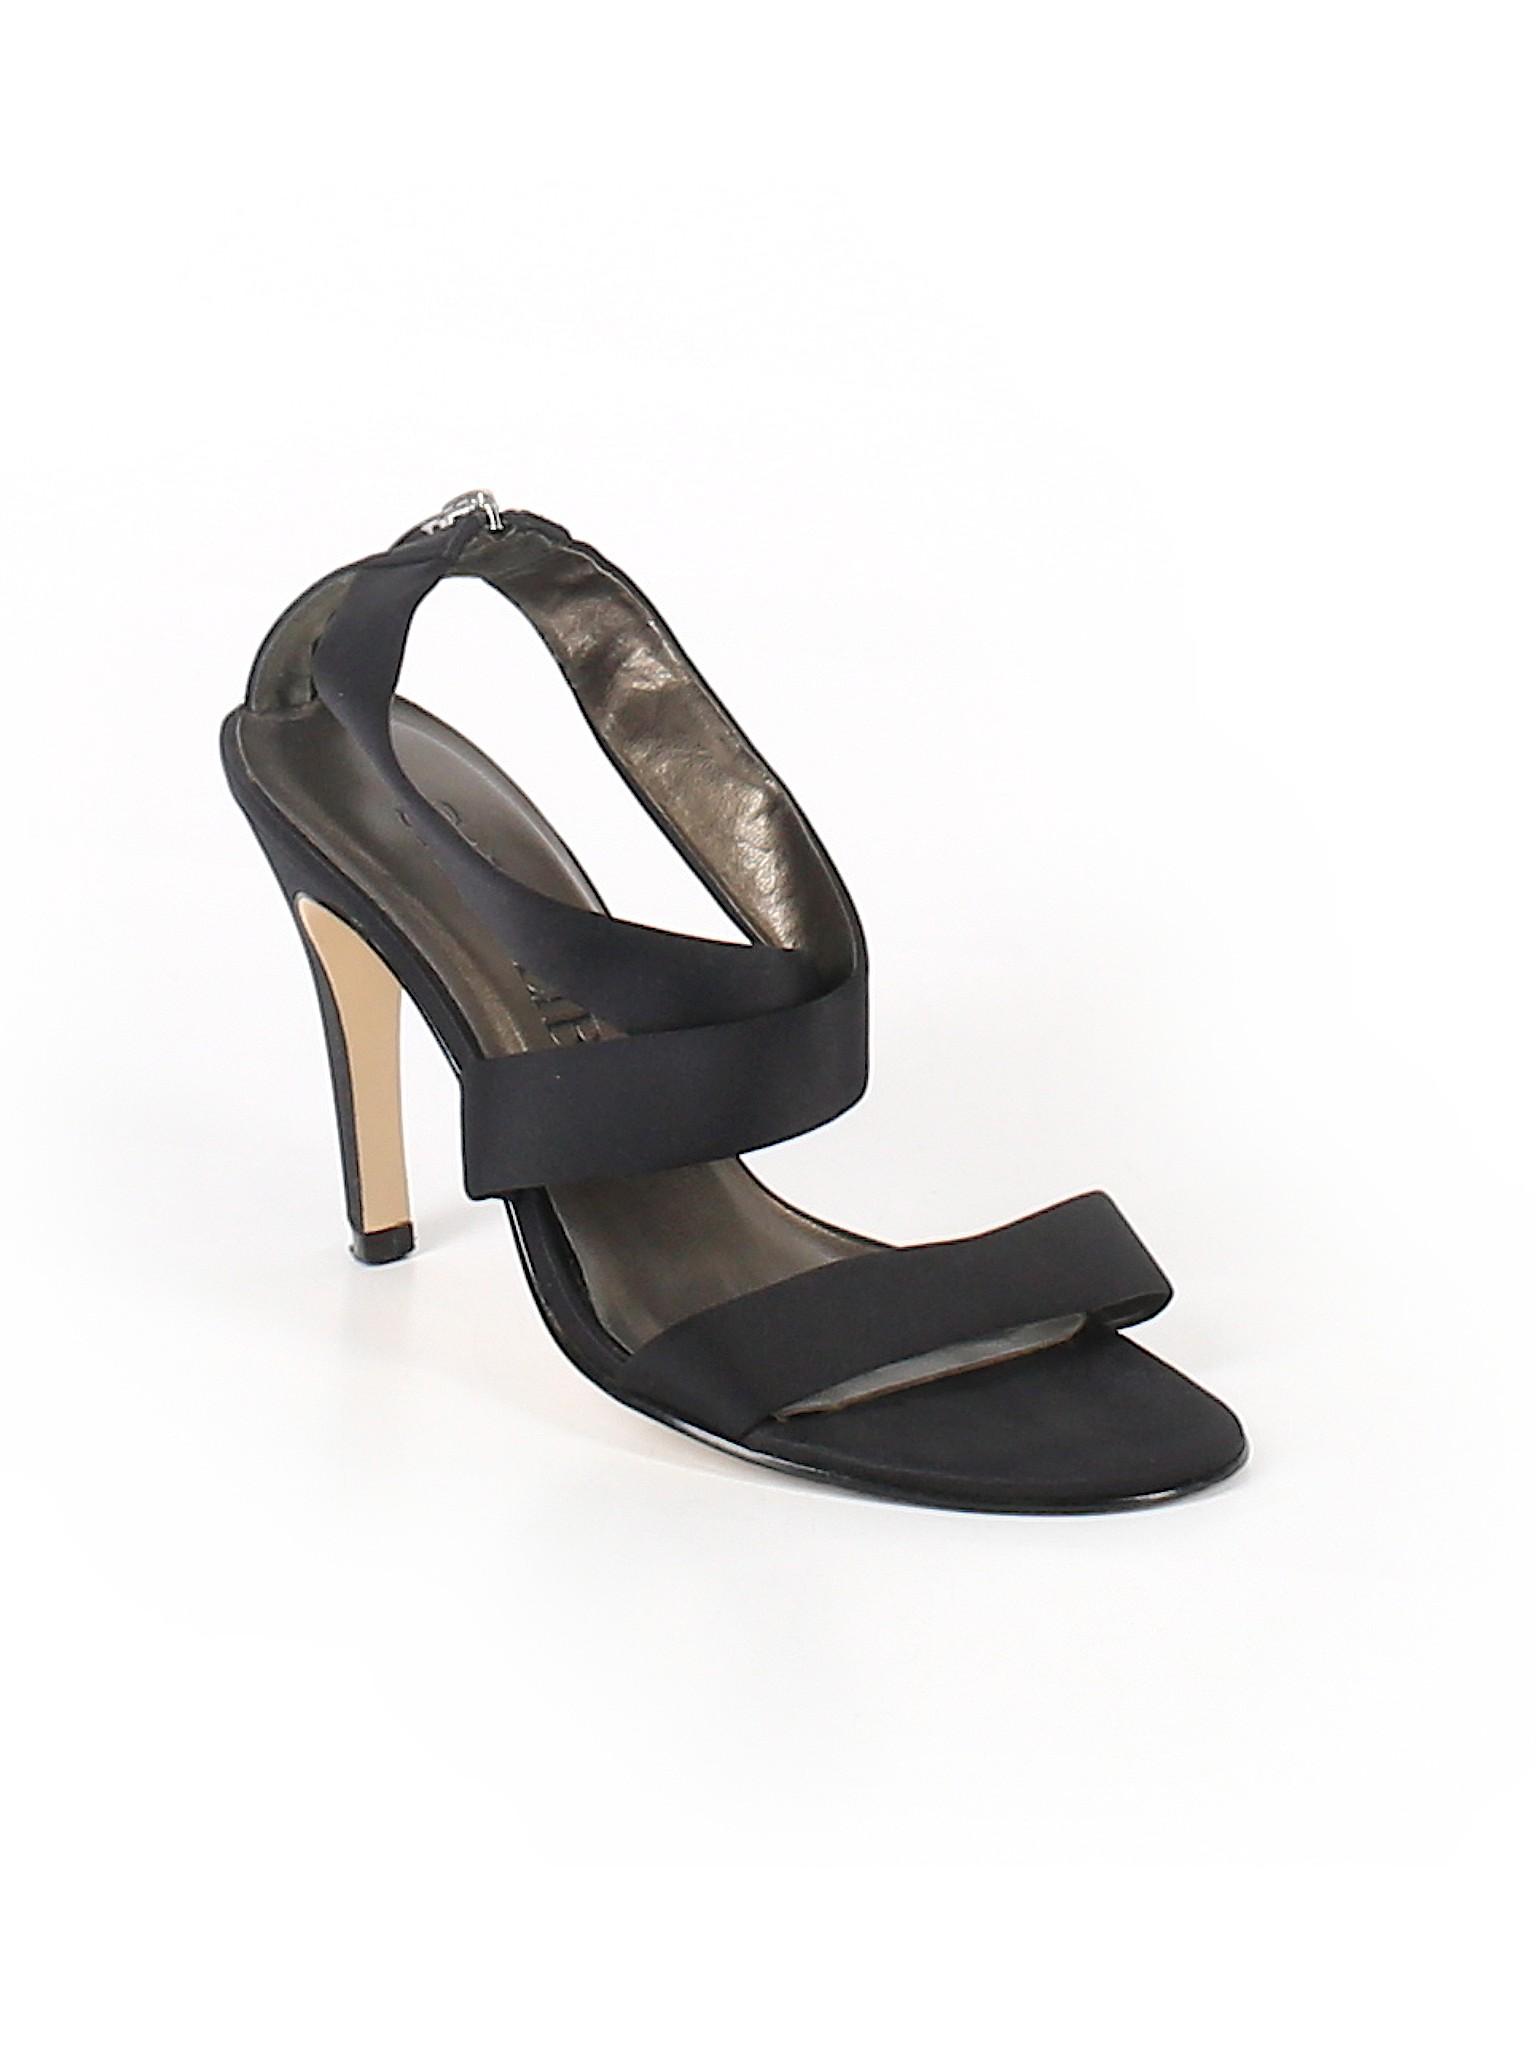 amp; Libby Sam Boutique promotion Heels ZqxzawE